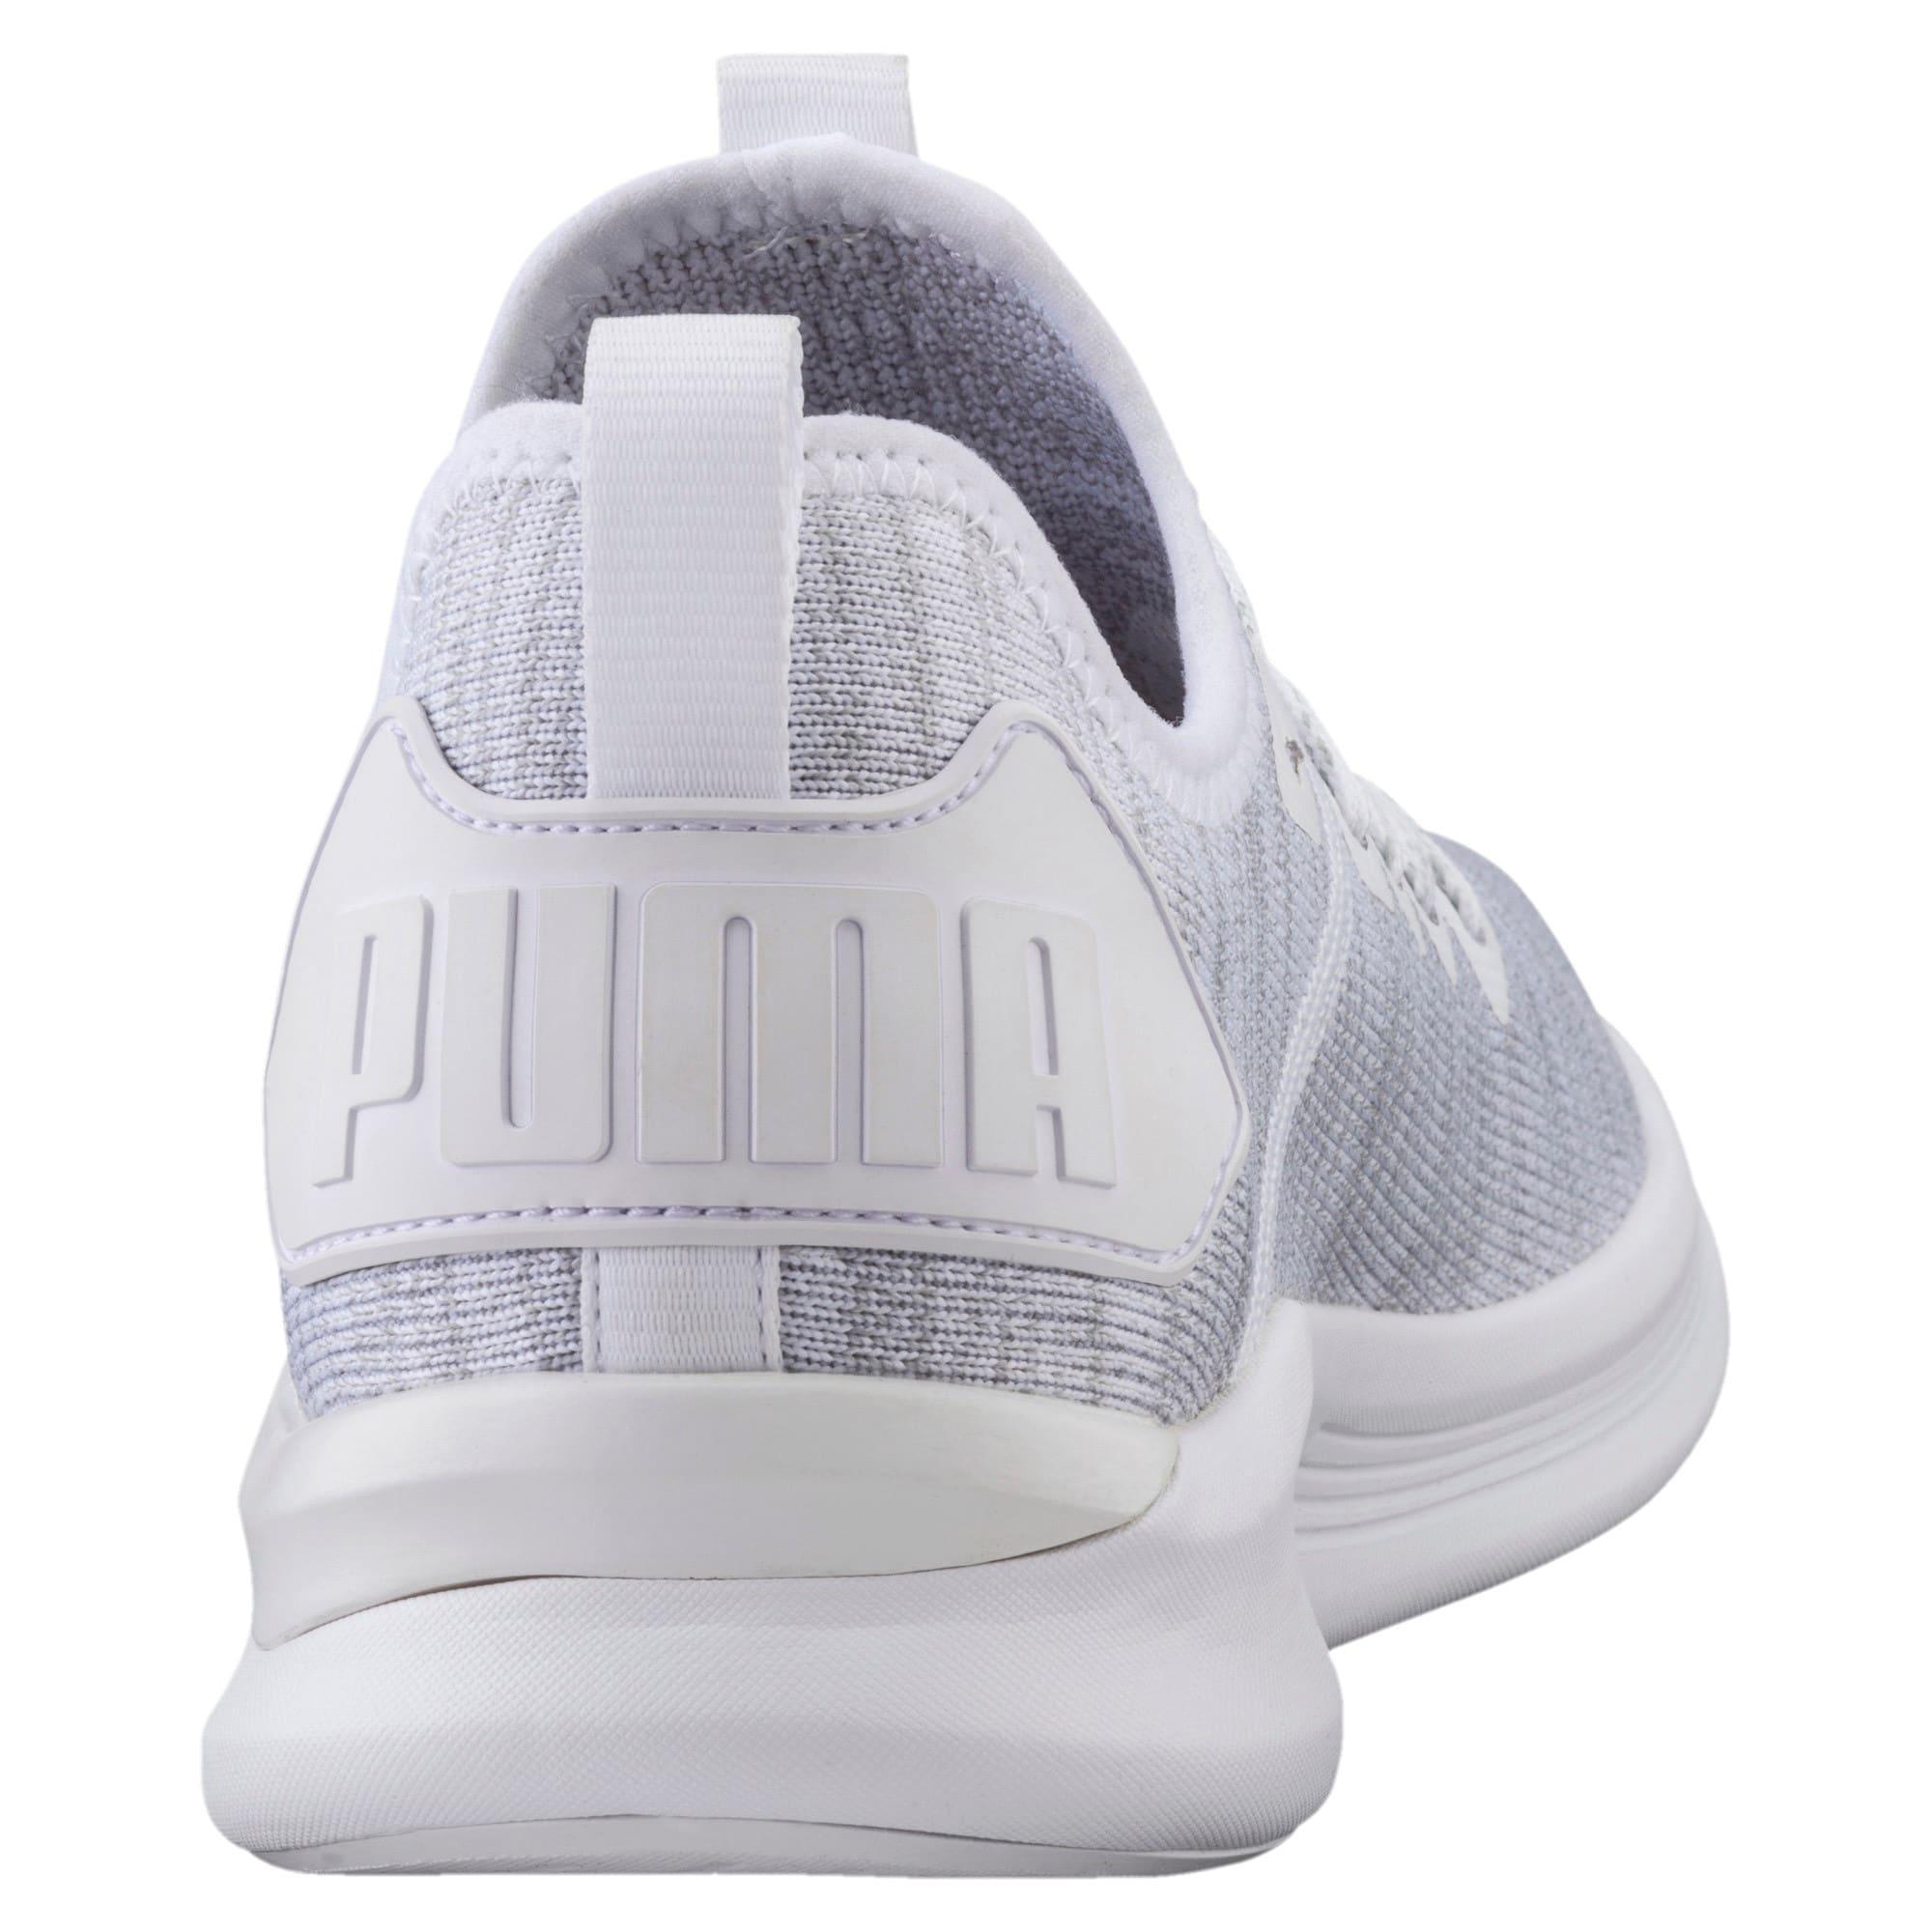 Thumbnail 4 of IGNITE Flash evoKNIT Men's Training Shoes, Puma White, medium-IND